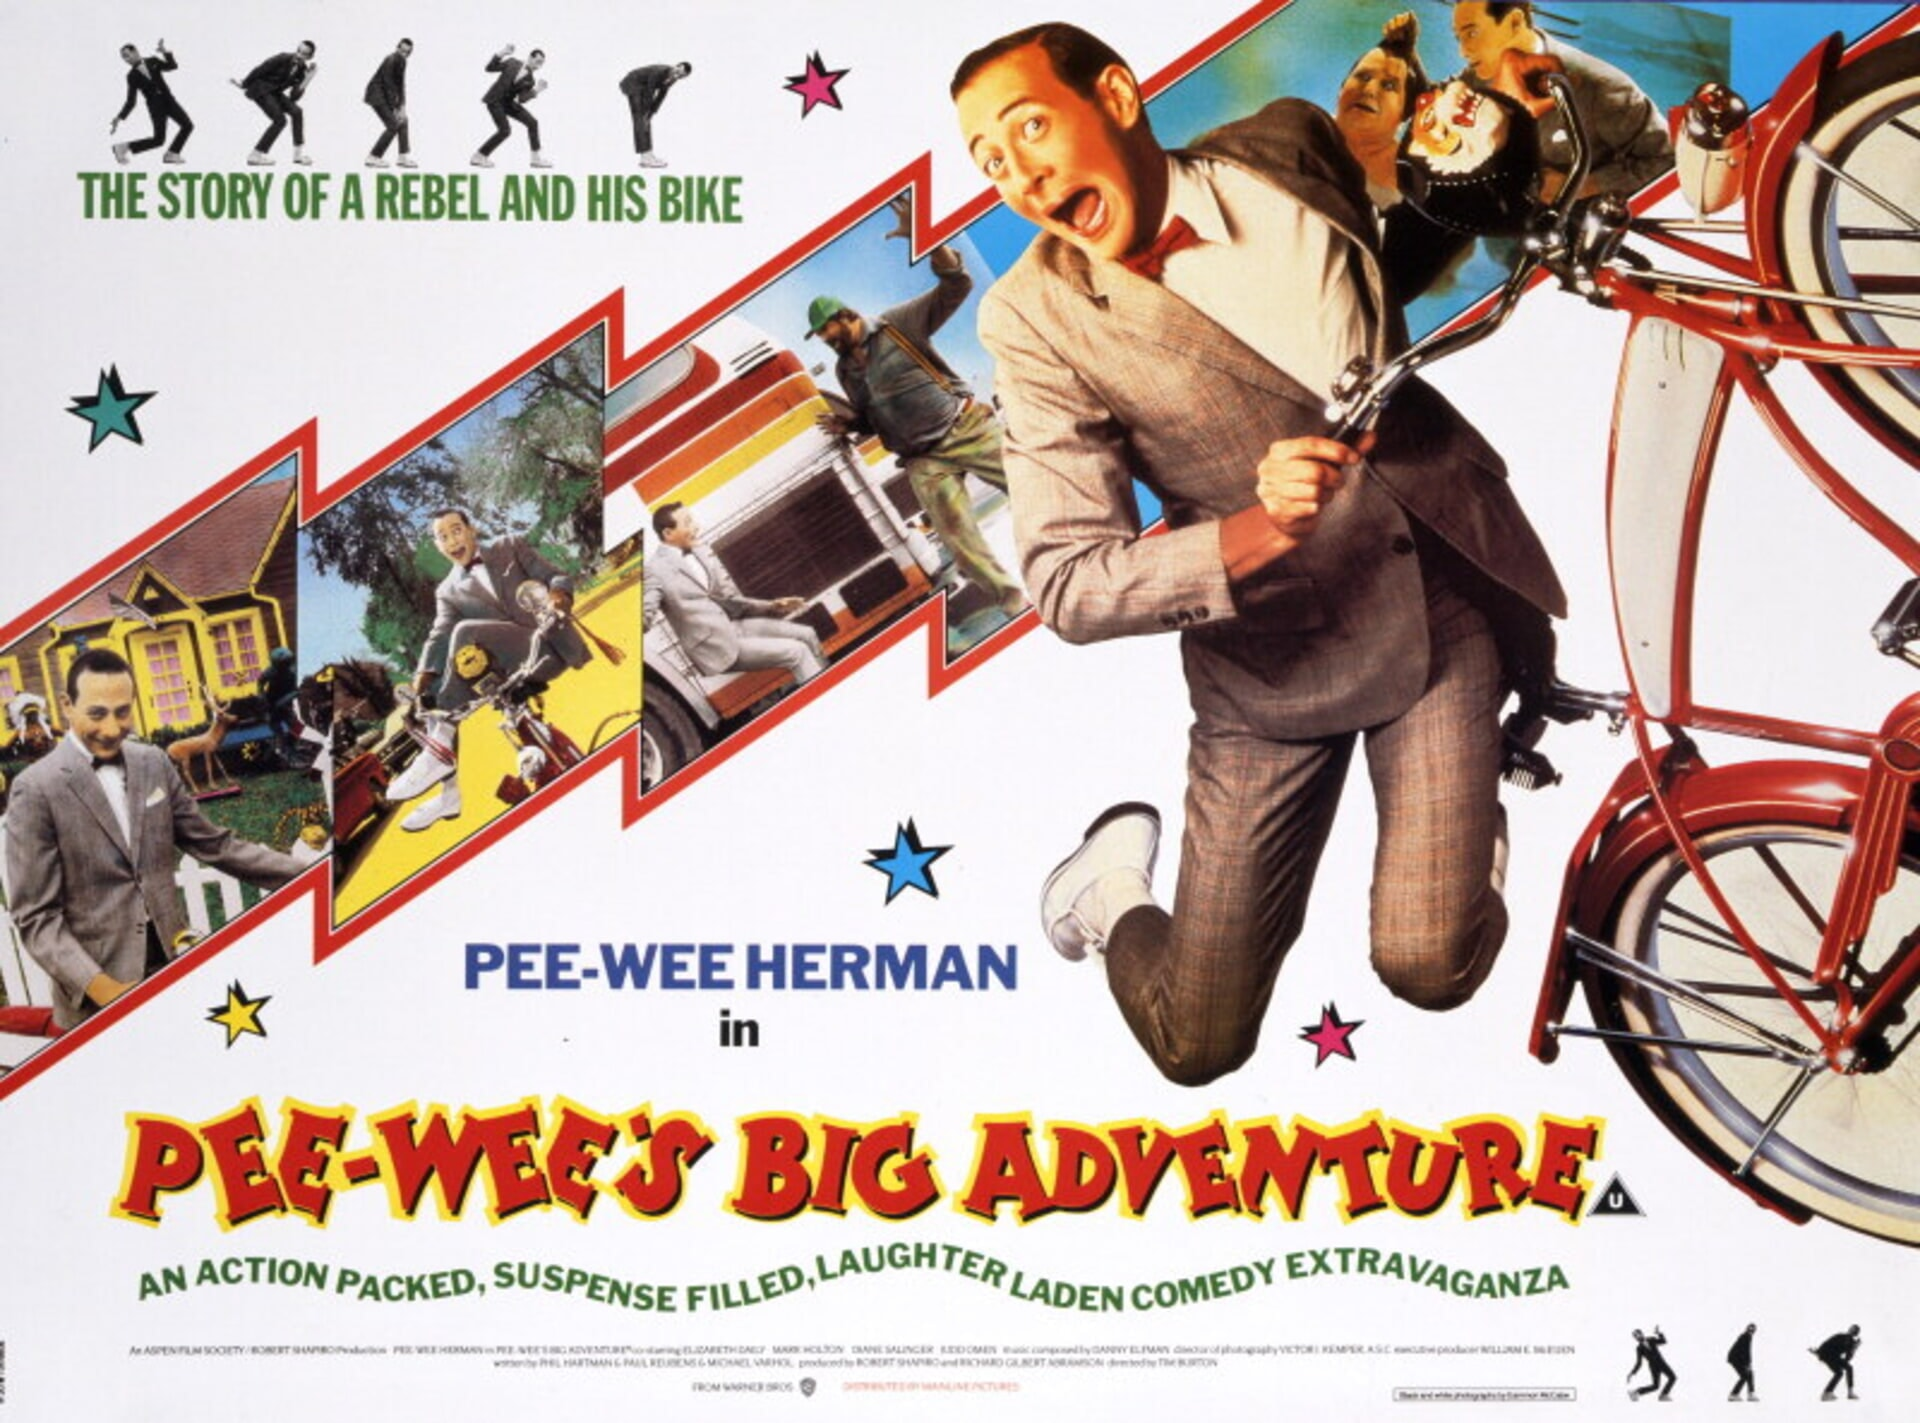 Pee-wee's Big Adventure - Poster 2